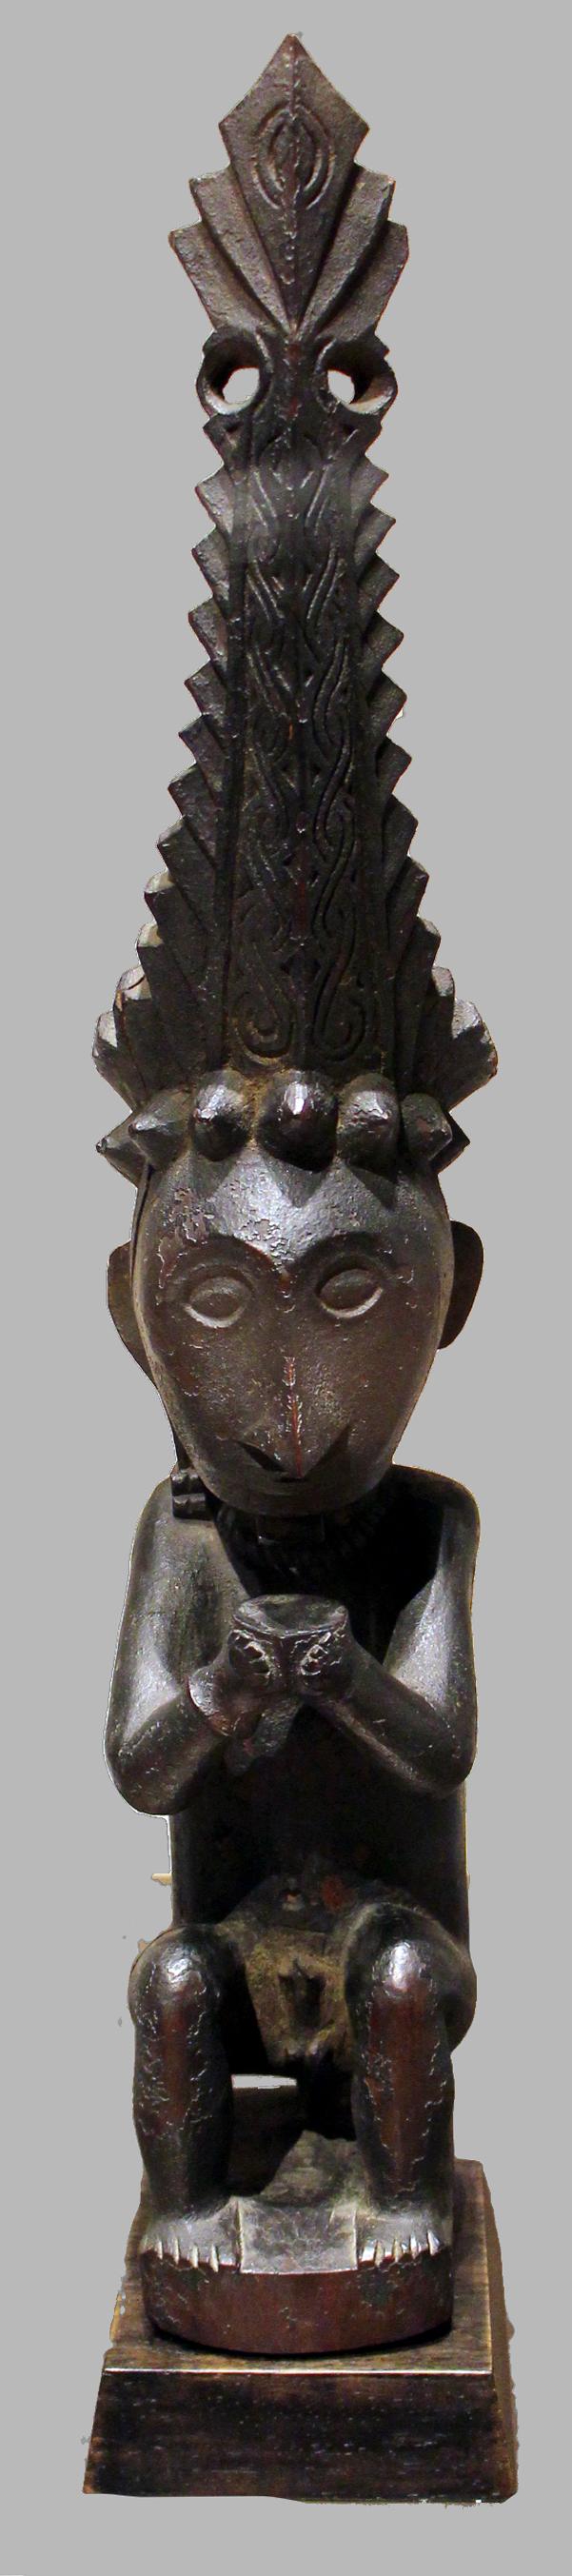 Seated Male Ancestor Figure |  Adu Sihara Salawa  © Musée du Quai-Branly | France